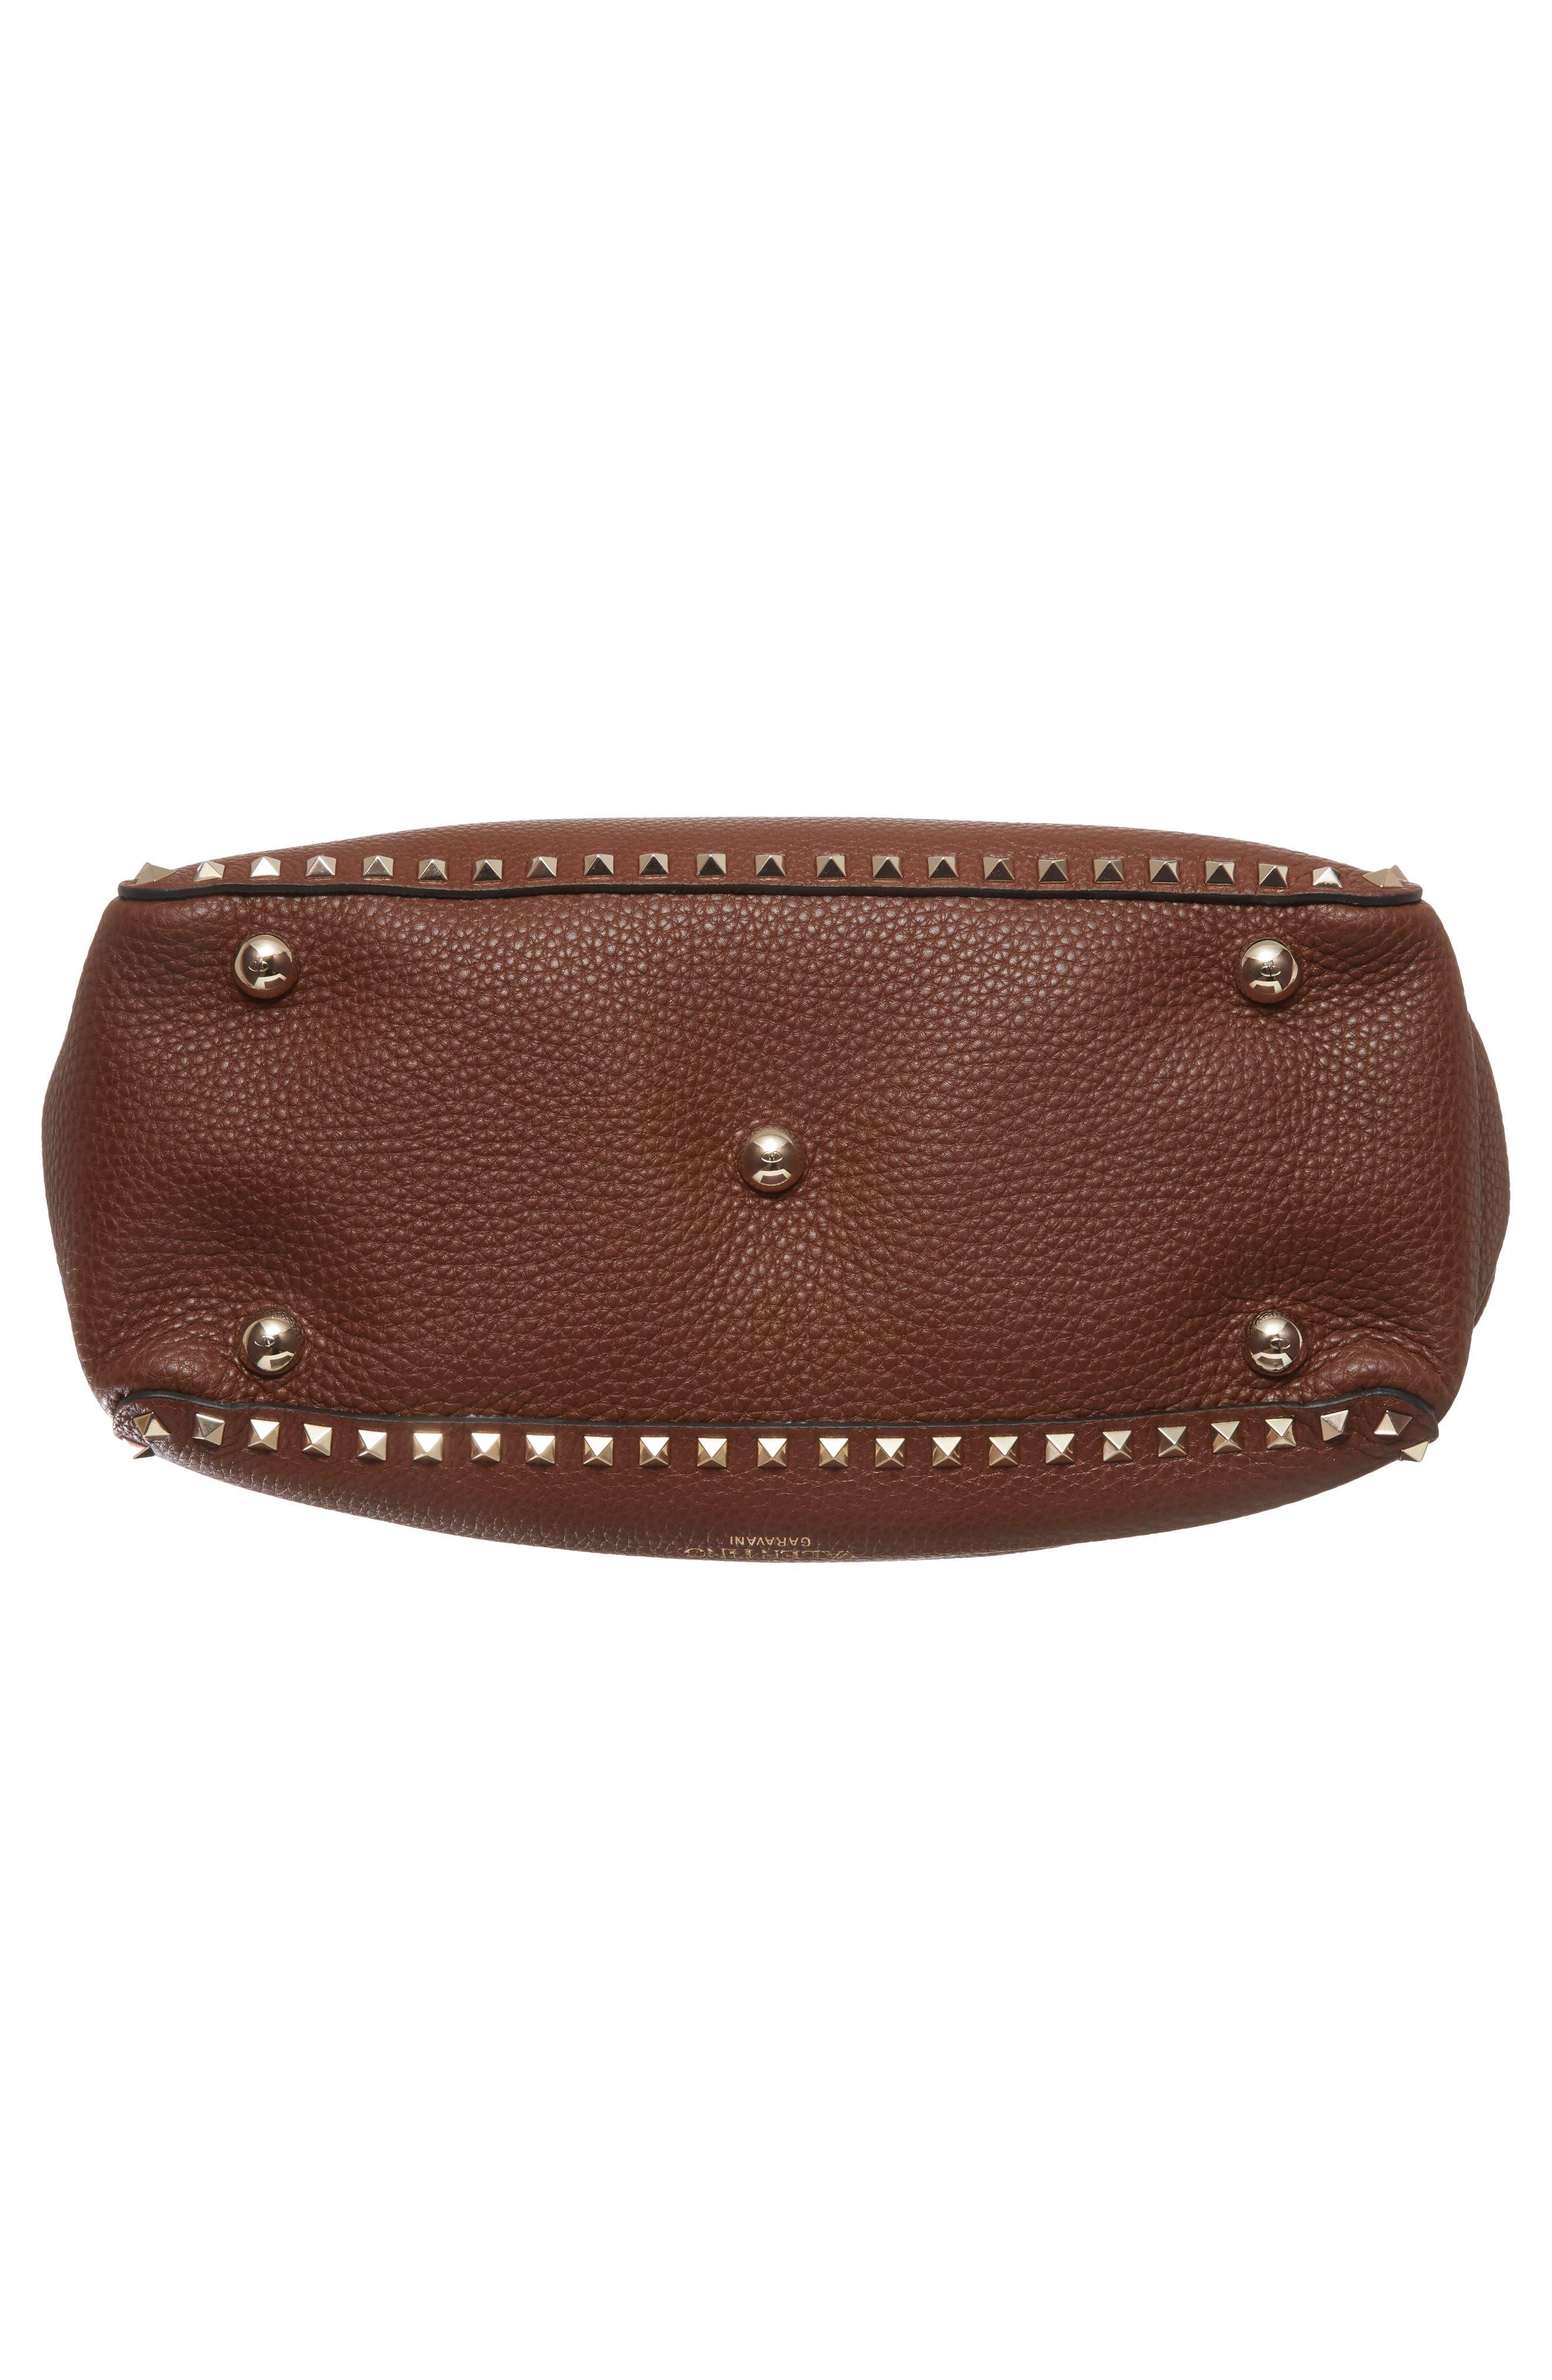 Alternate Image 5  - Valentino 'Rockstud' Grained Calfskin Leather Tote